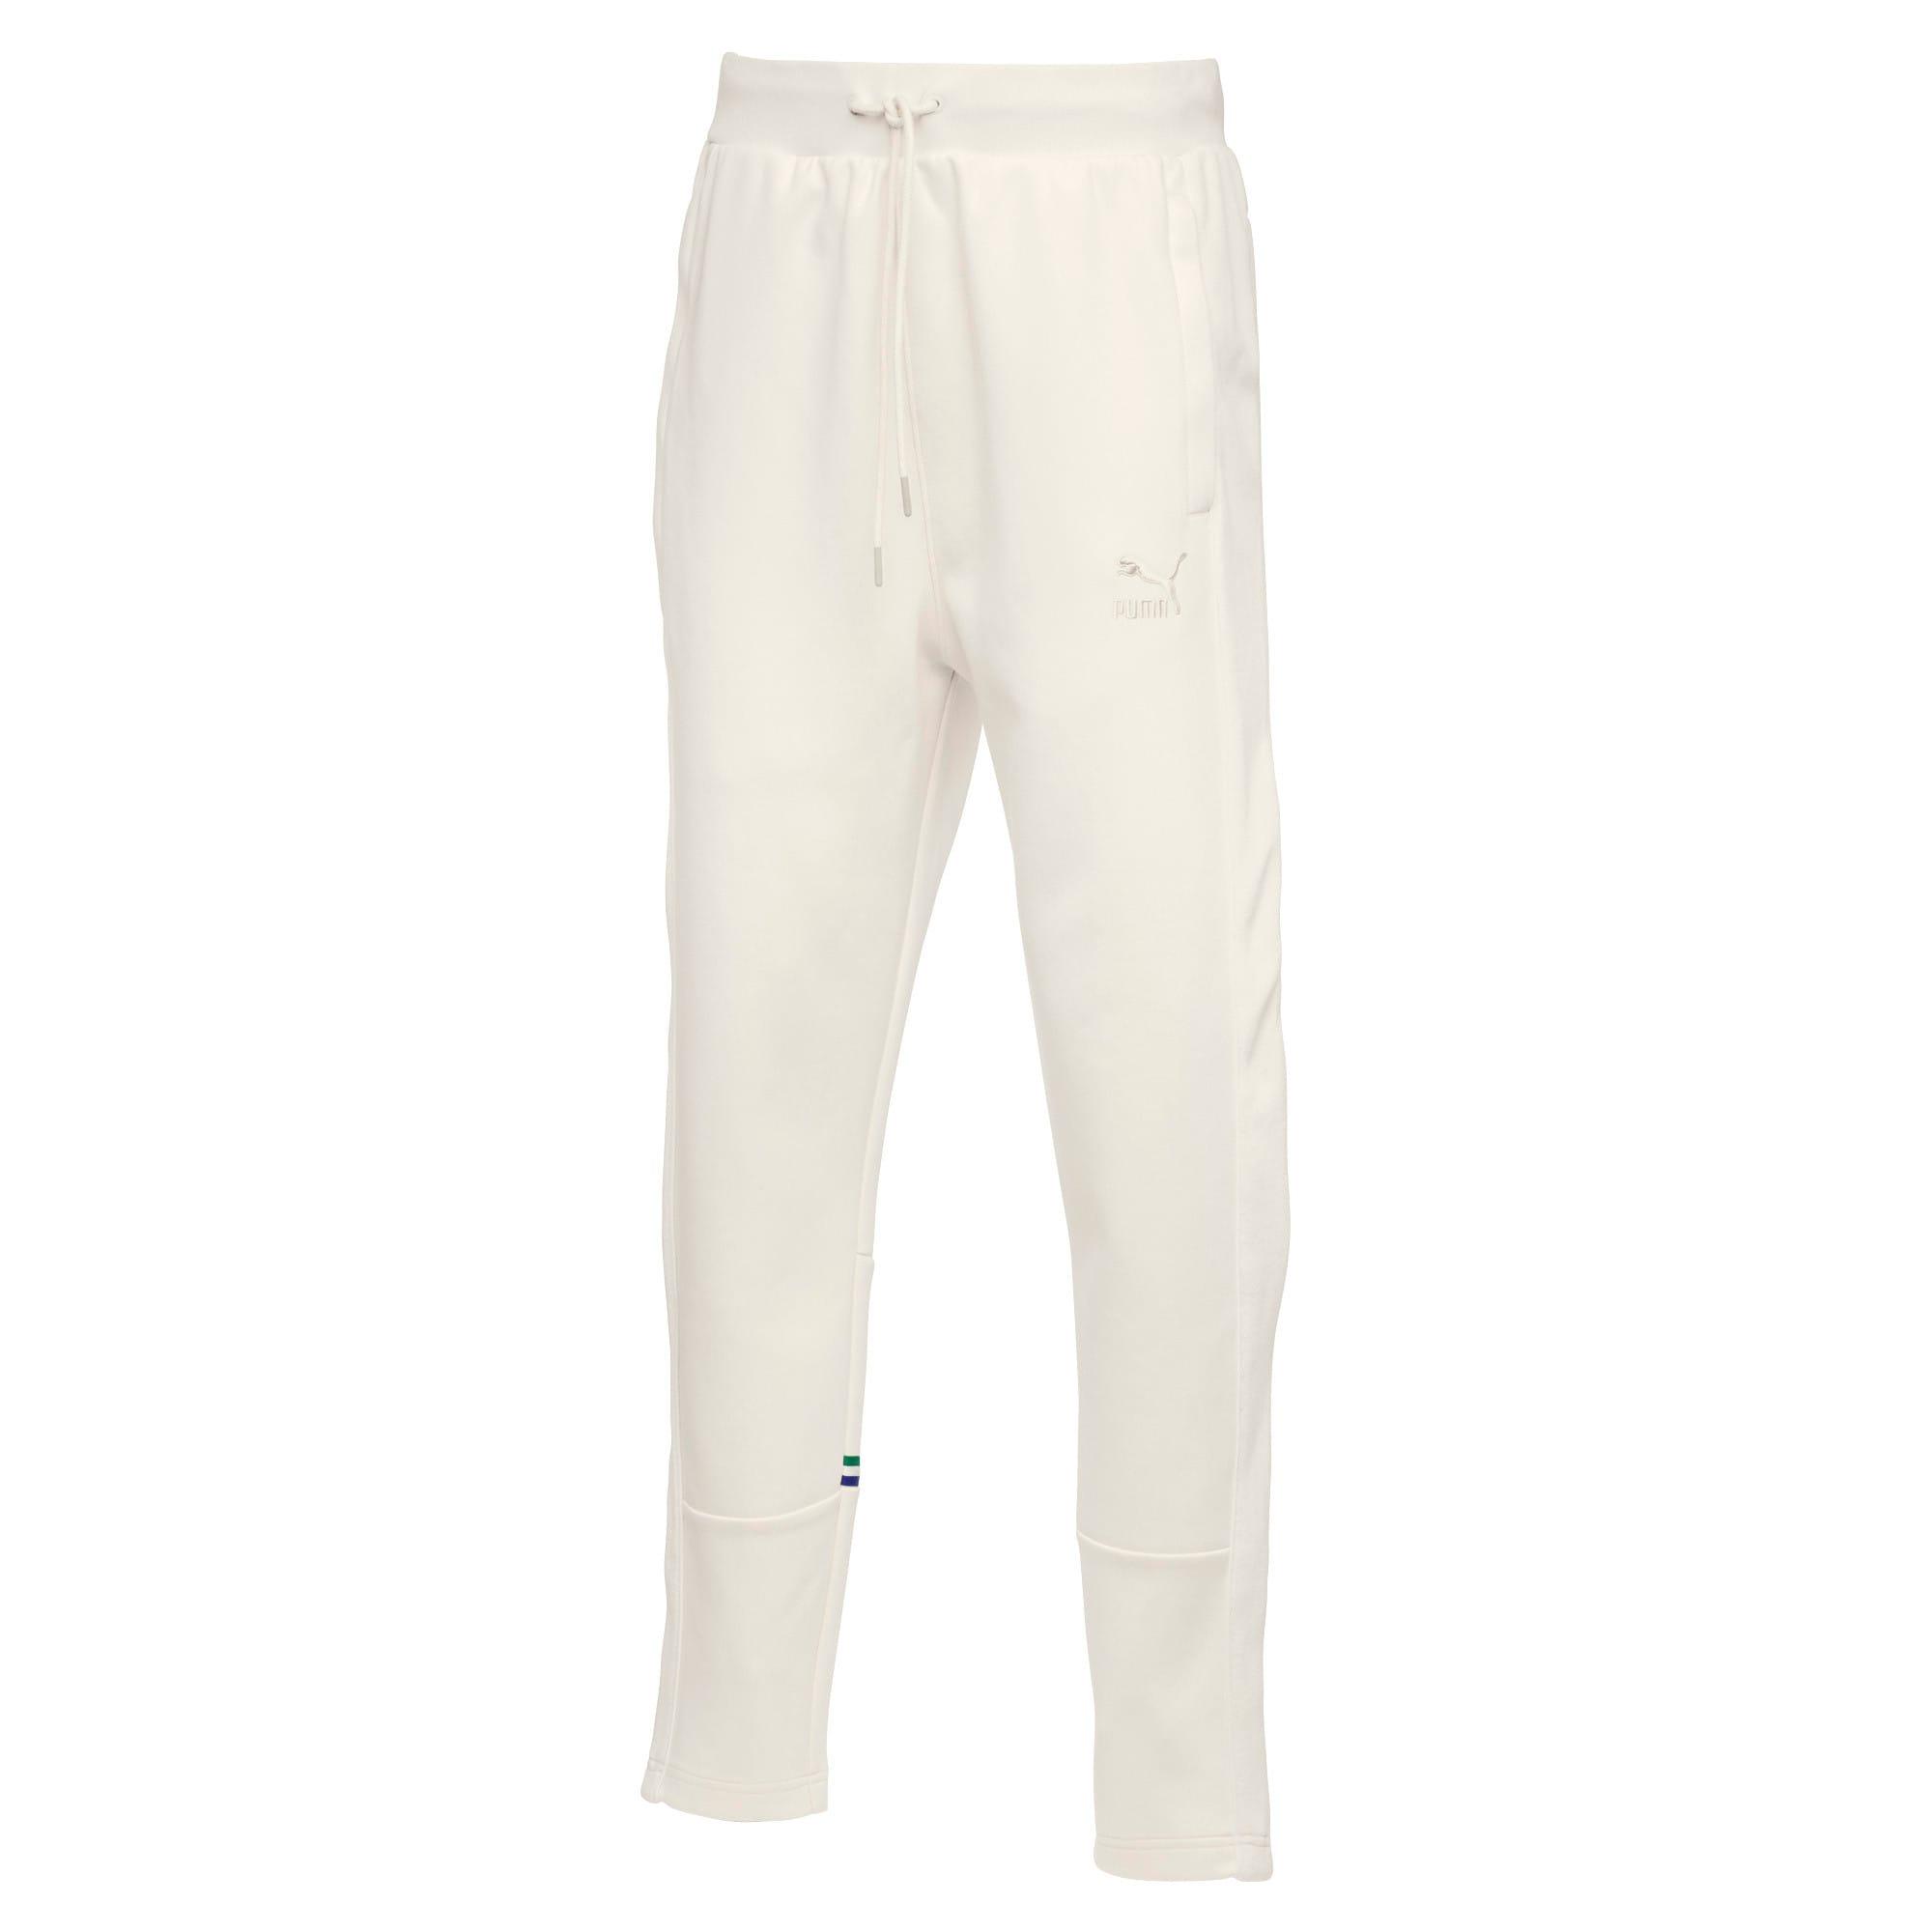 Thumbnail 1 of PUMA x BIG SEAN T7 Track Pants, Whisper White, medium